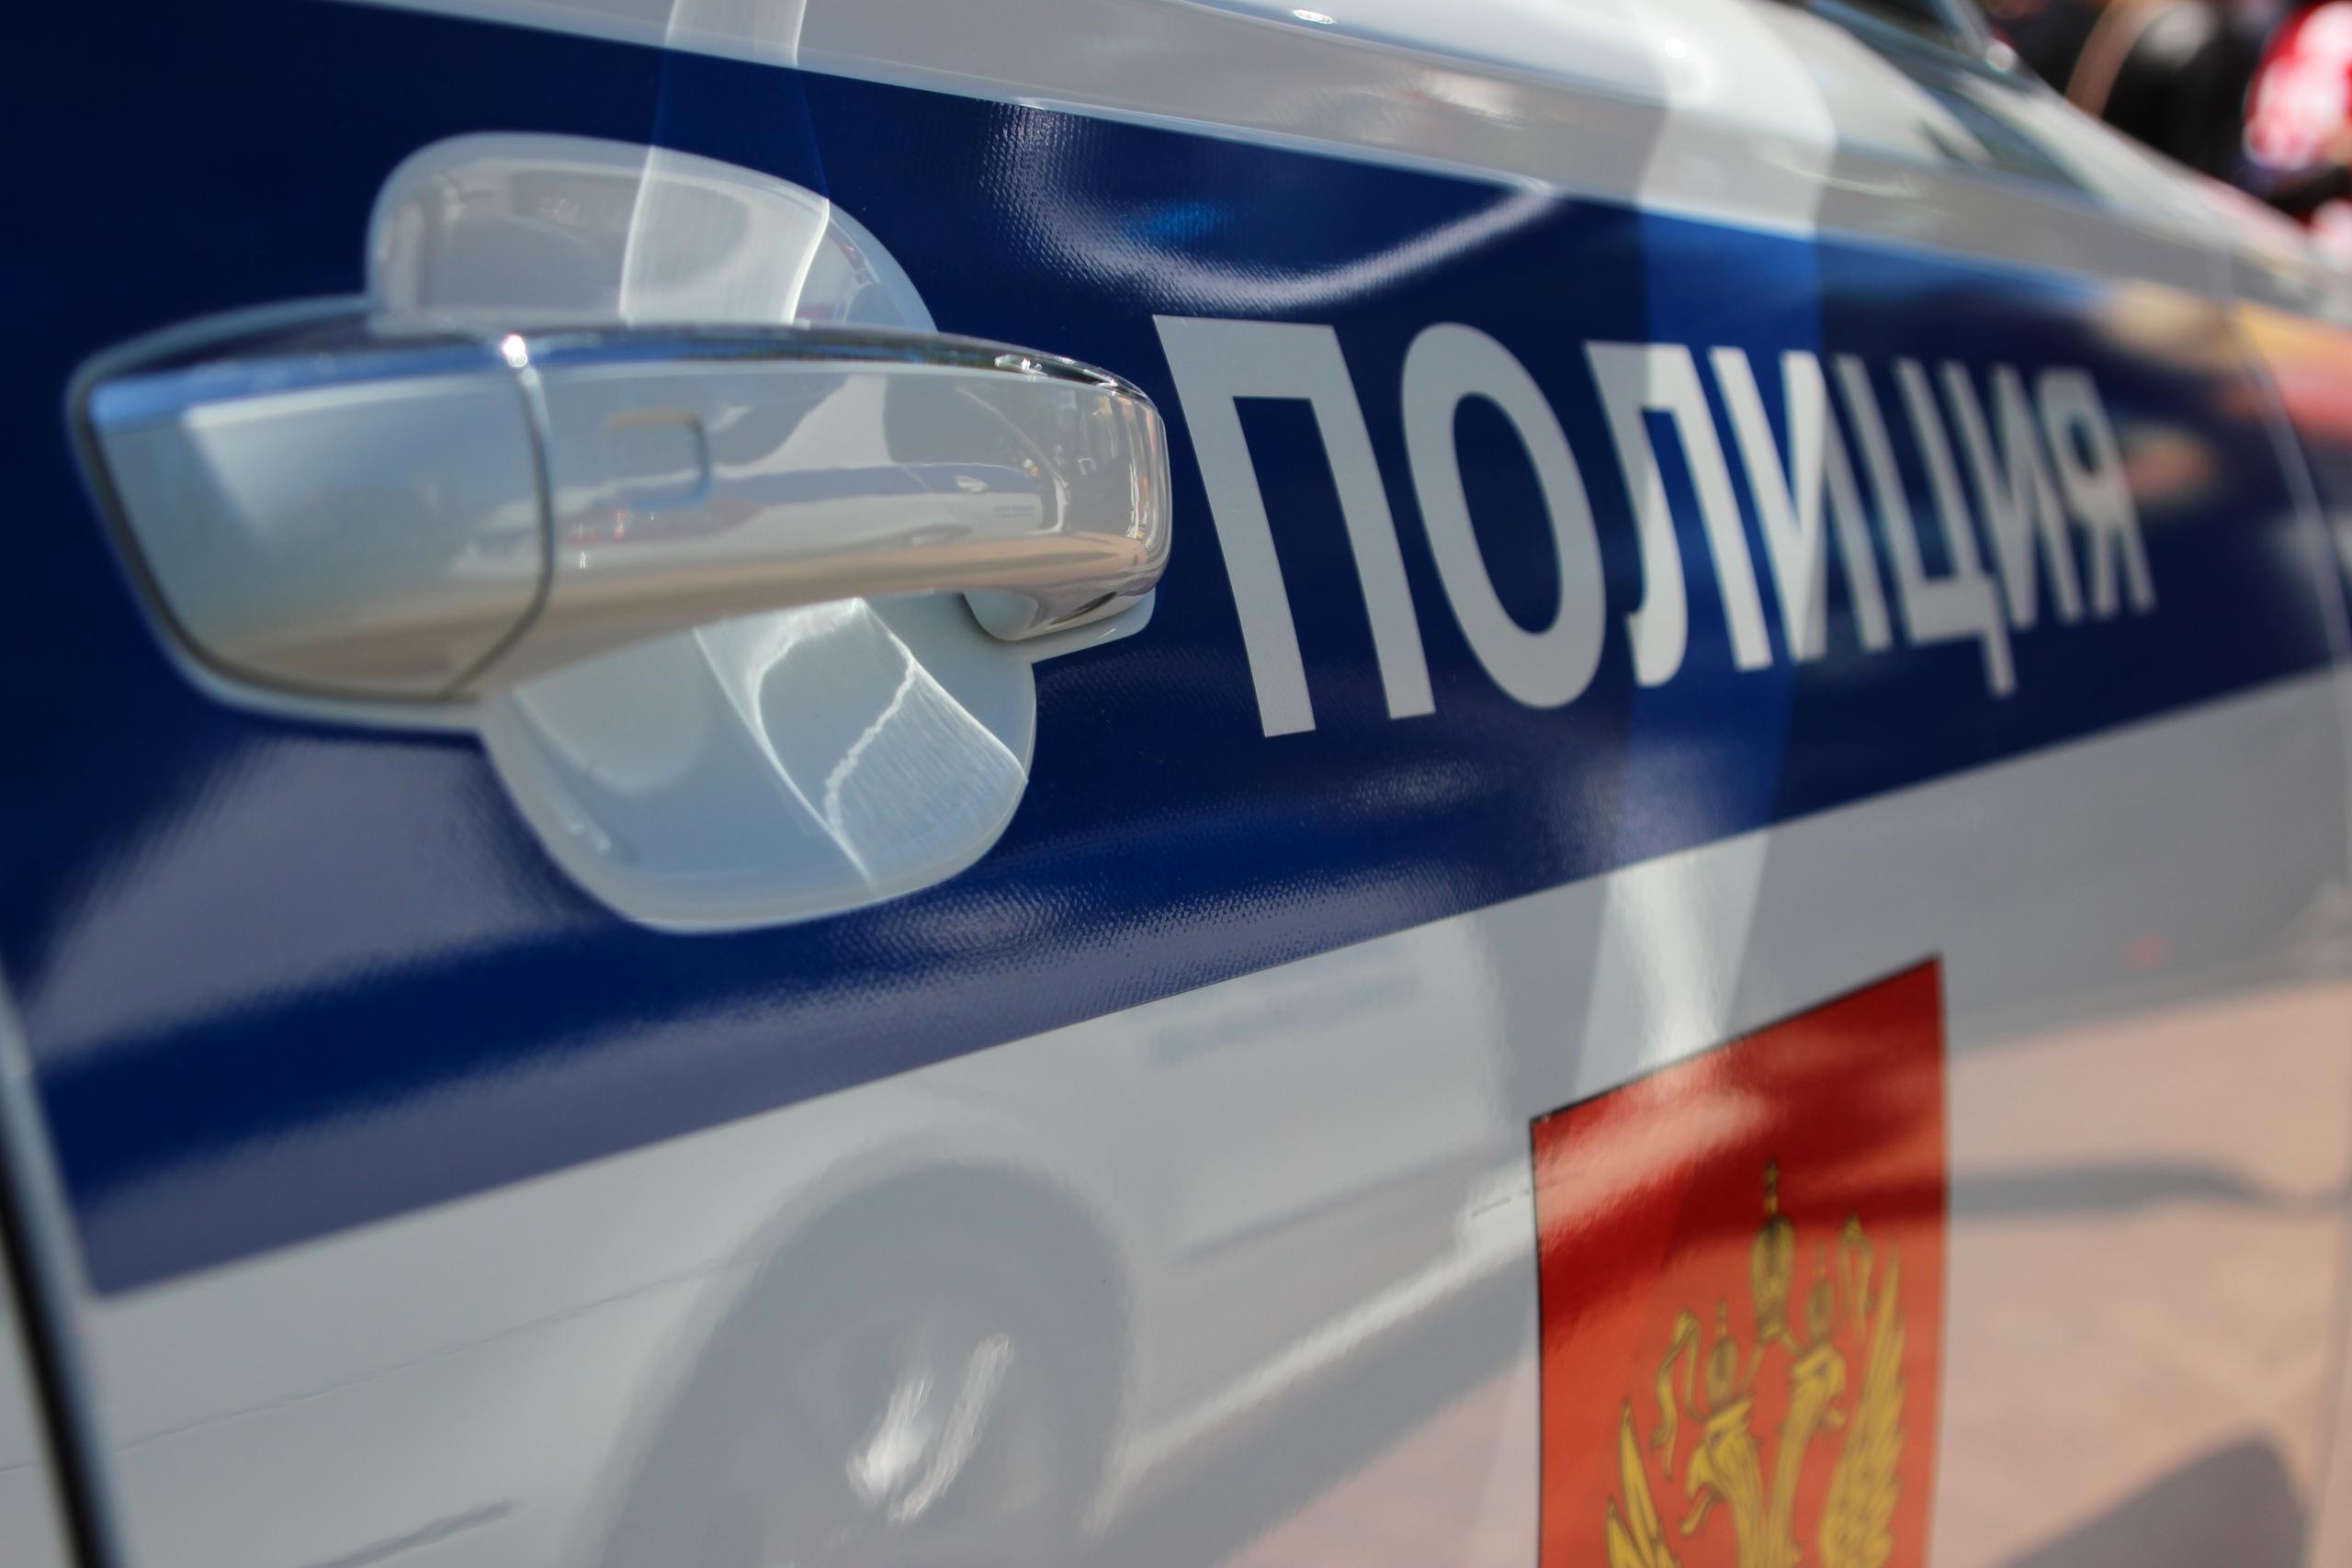 В центре Твери полицейские закрыли наркопритон - новости Афанасий